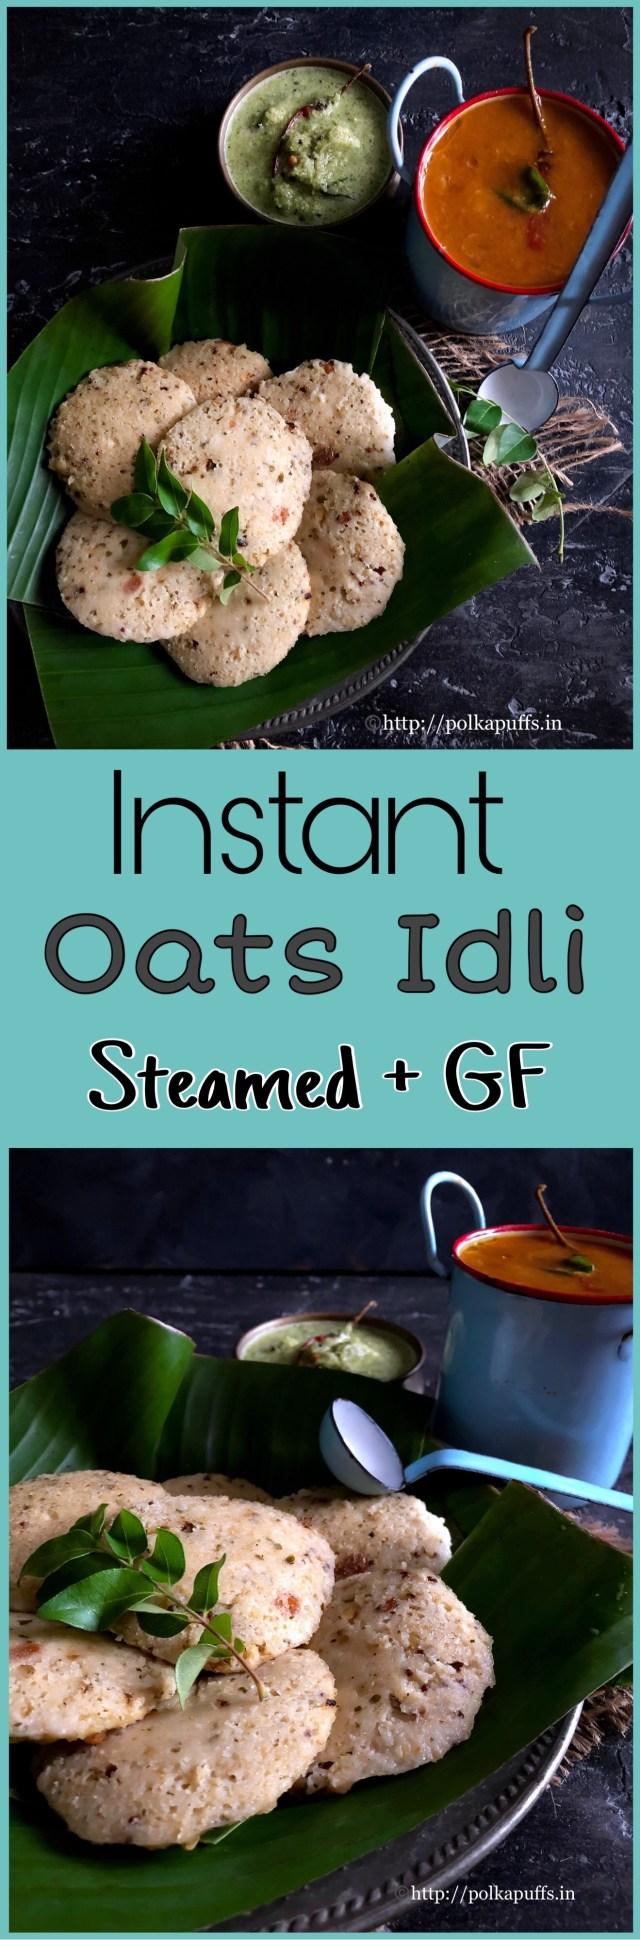 Instant Oats Idli | Gluten free Oats Idli recipe